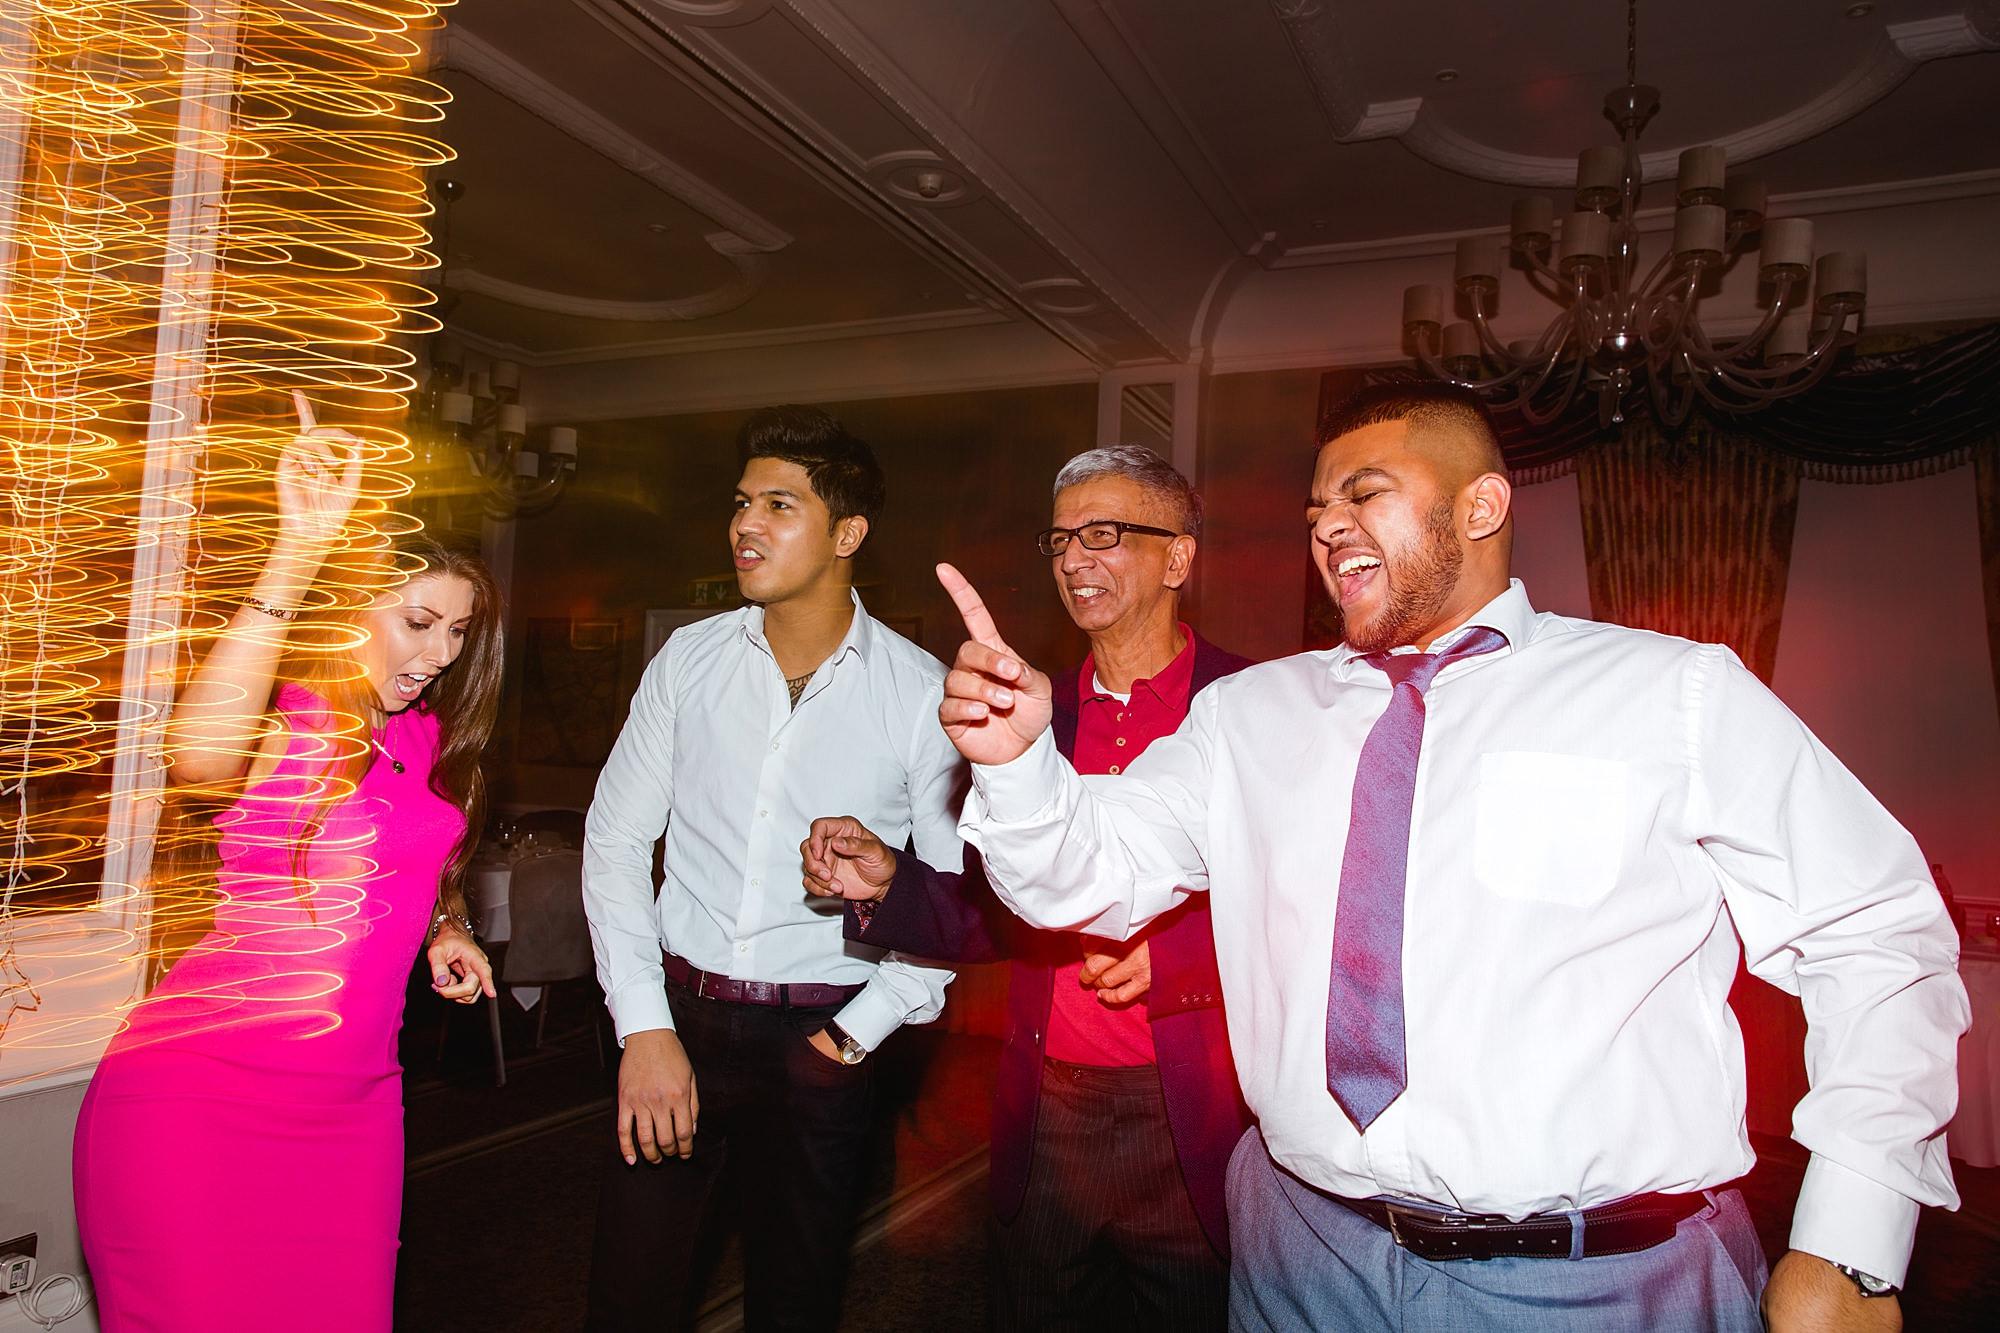 Richmond Hill Hotel wedding guests dancing